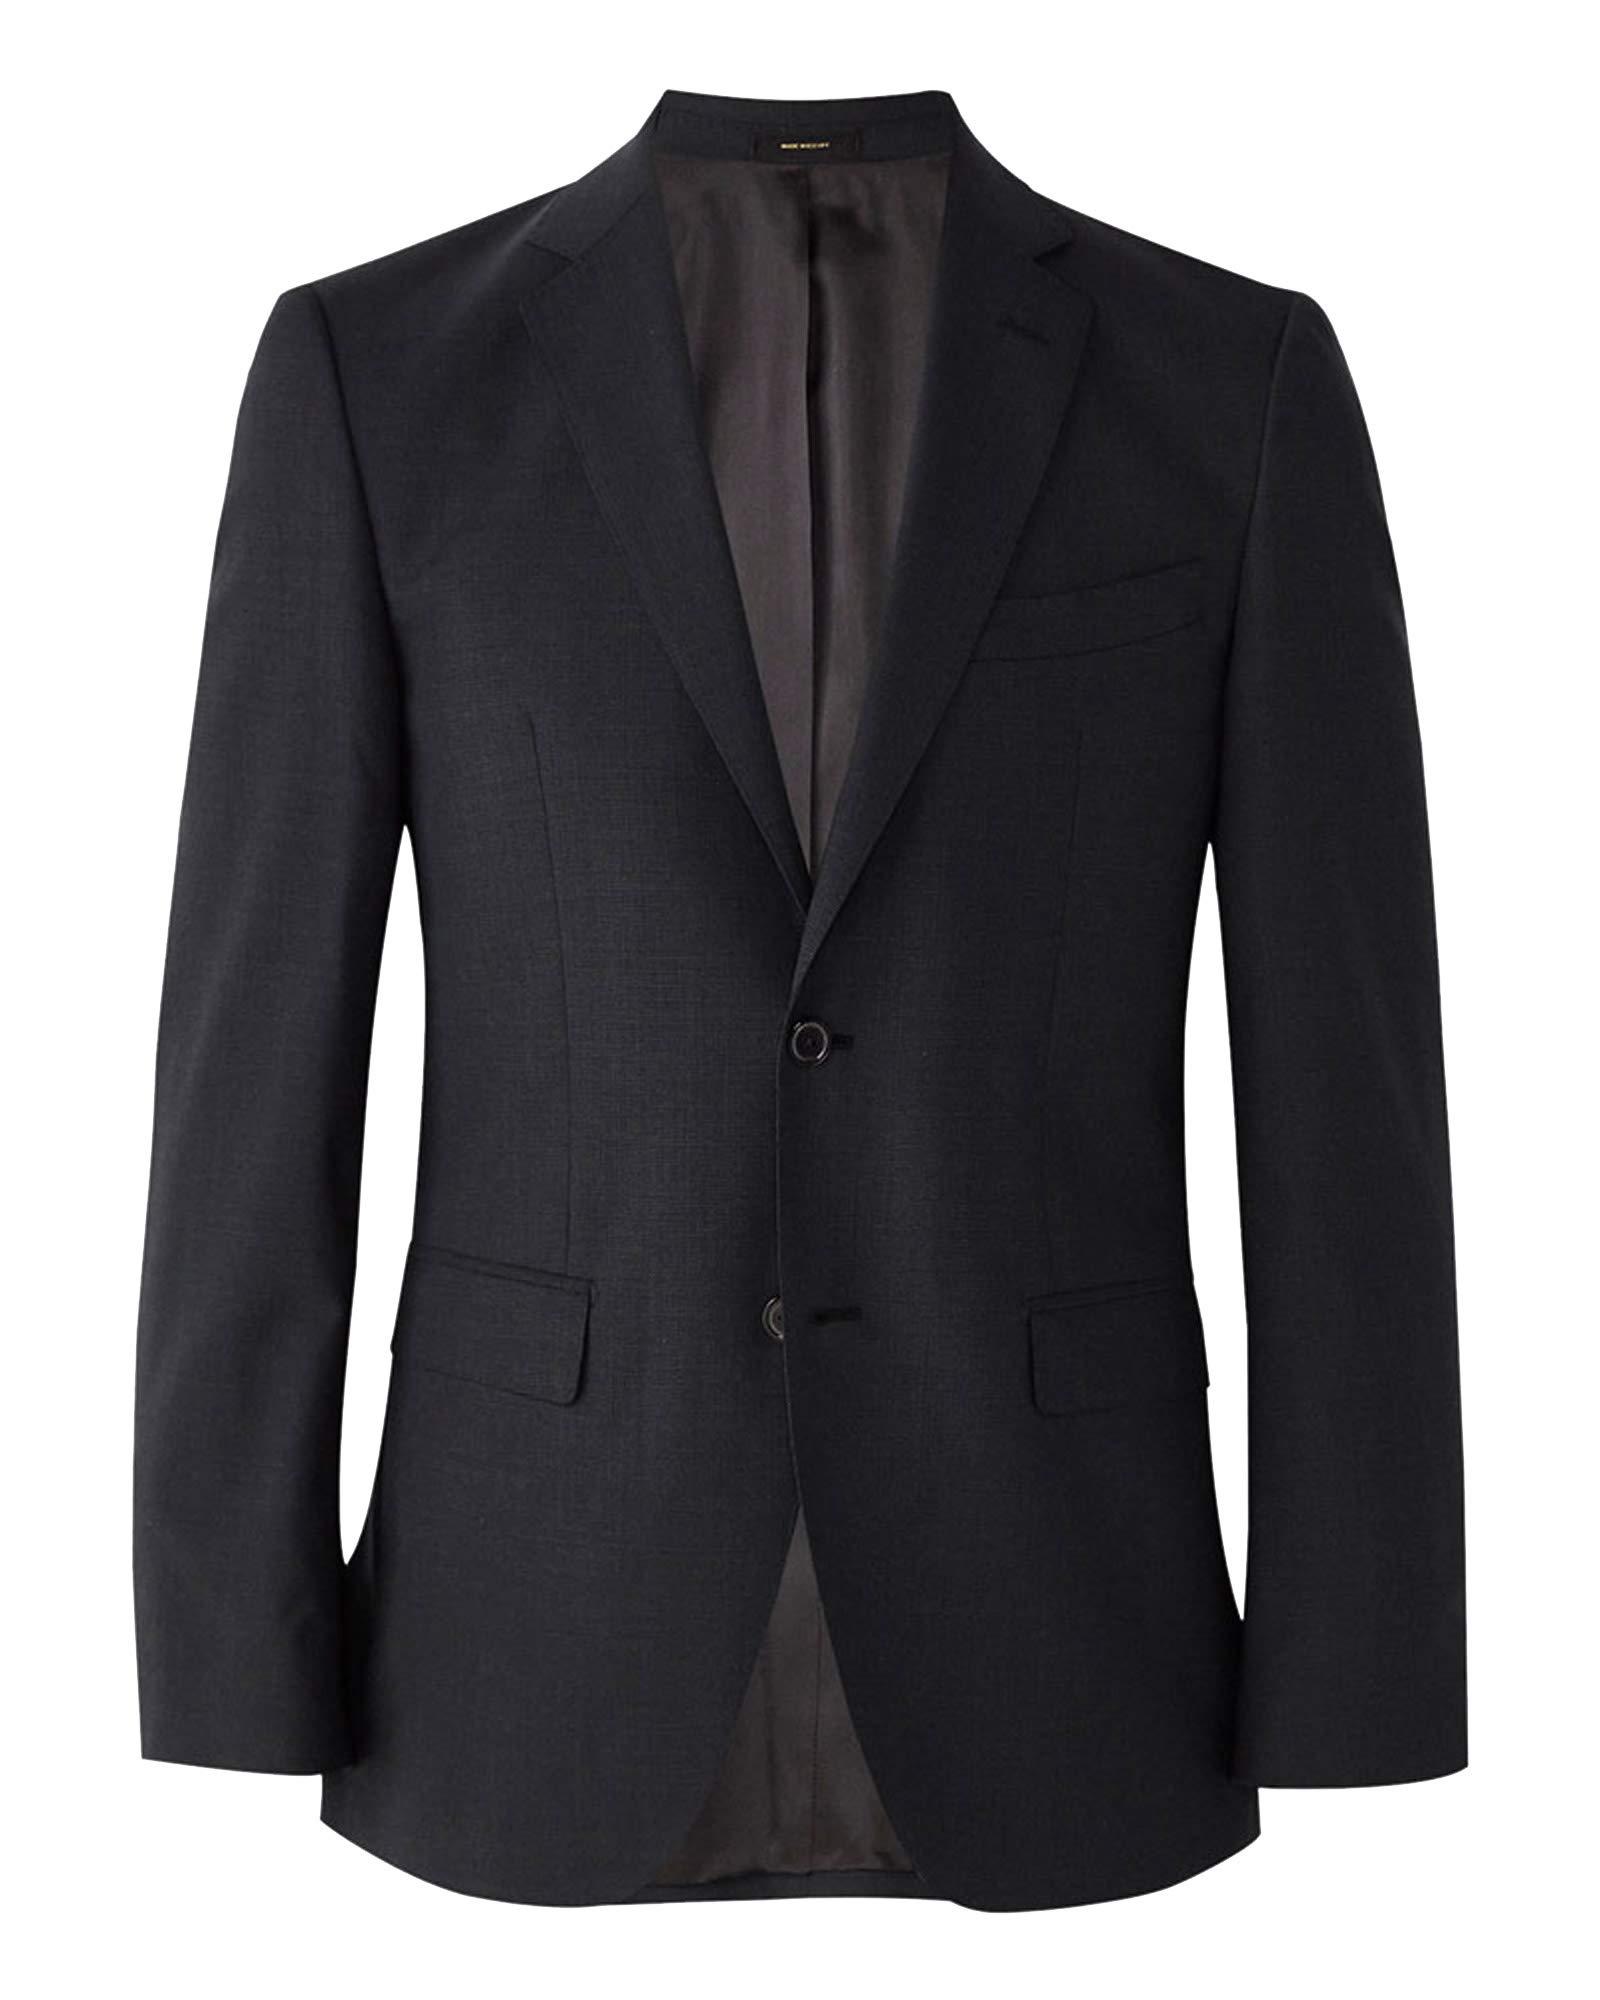 09a9f815163 Massimo Dutti Men Slim fit Plain Wool Blazer 2035 271 (58 EU) Grey